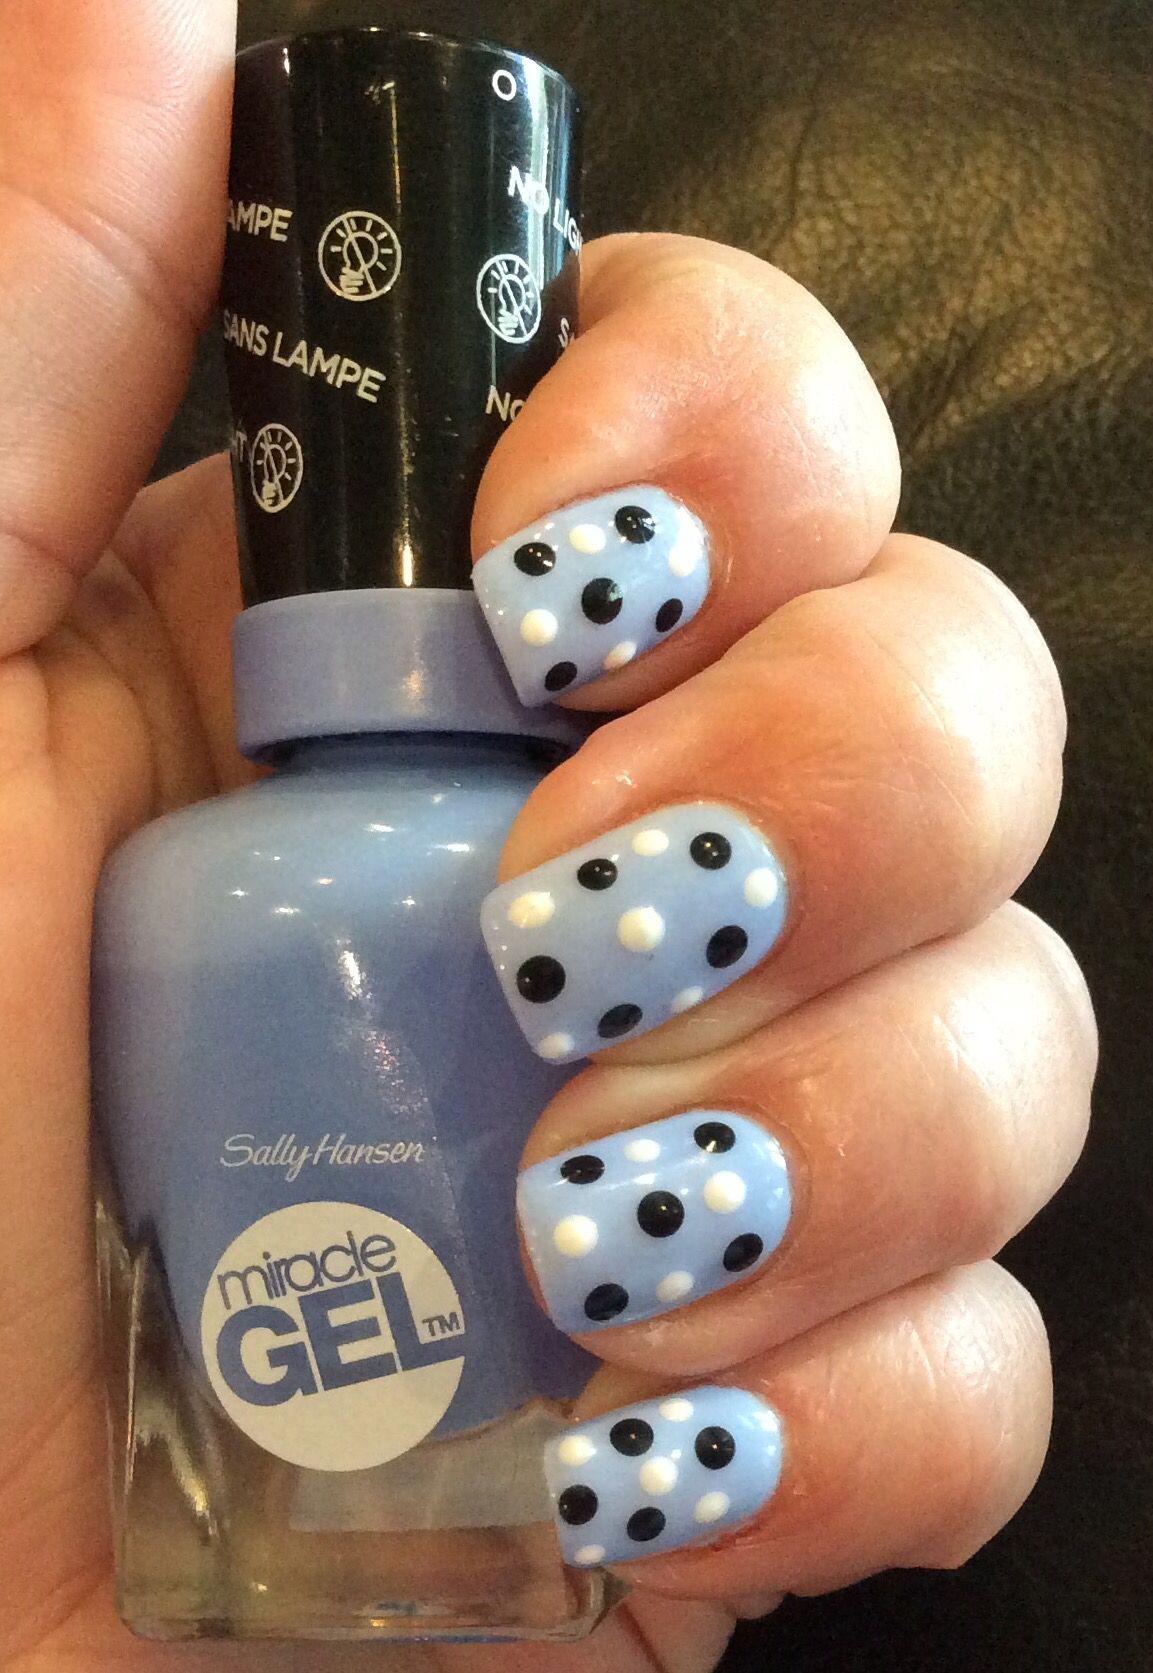 Polka dot nails #sallyhansen #miraclegel